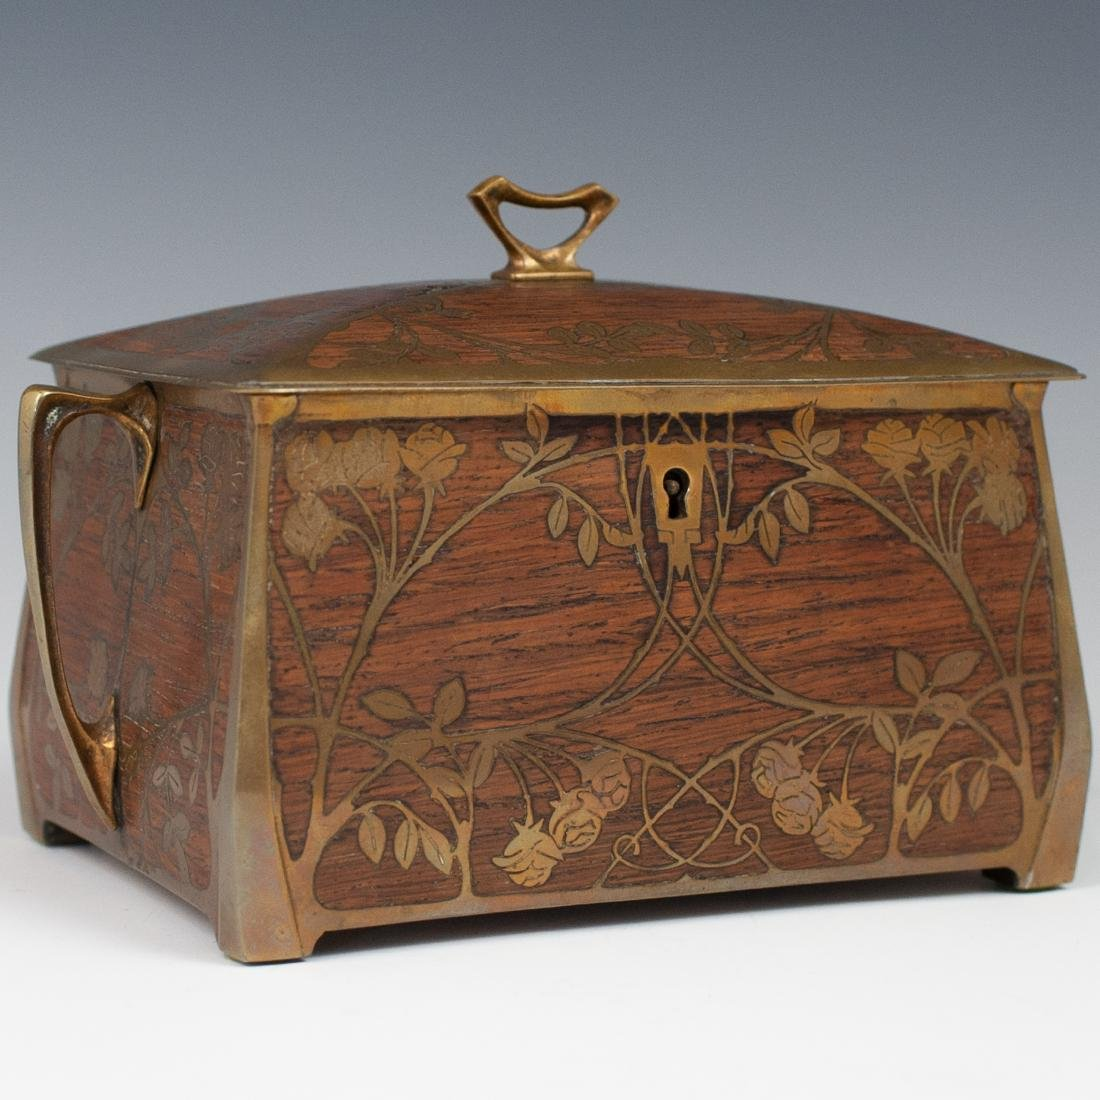 Art Nouveau Erhard Sohne Wood Box